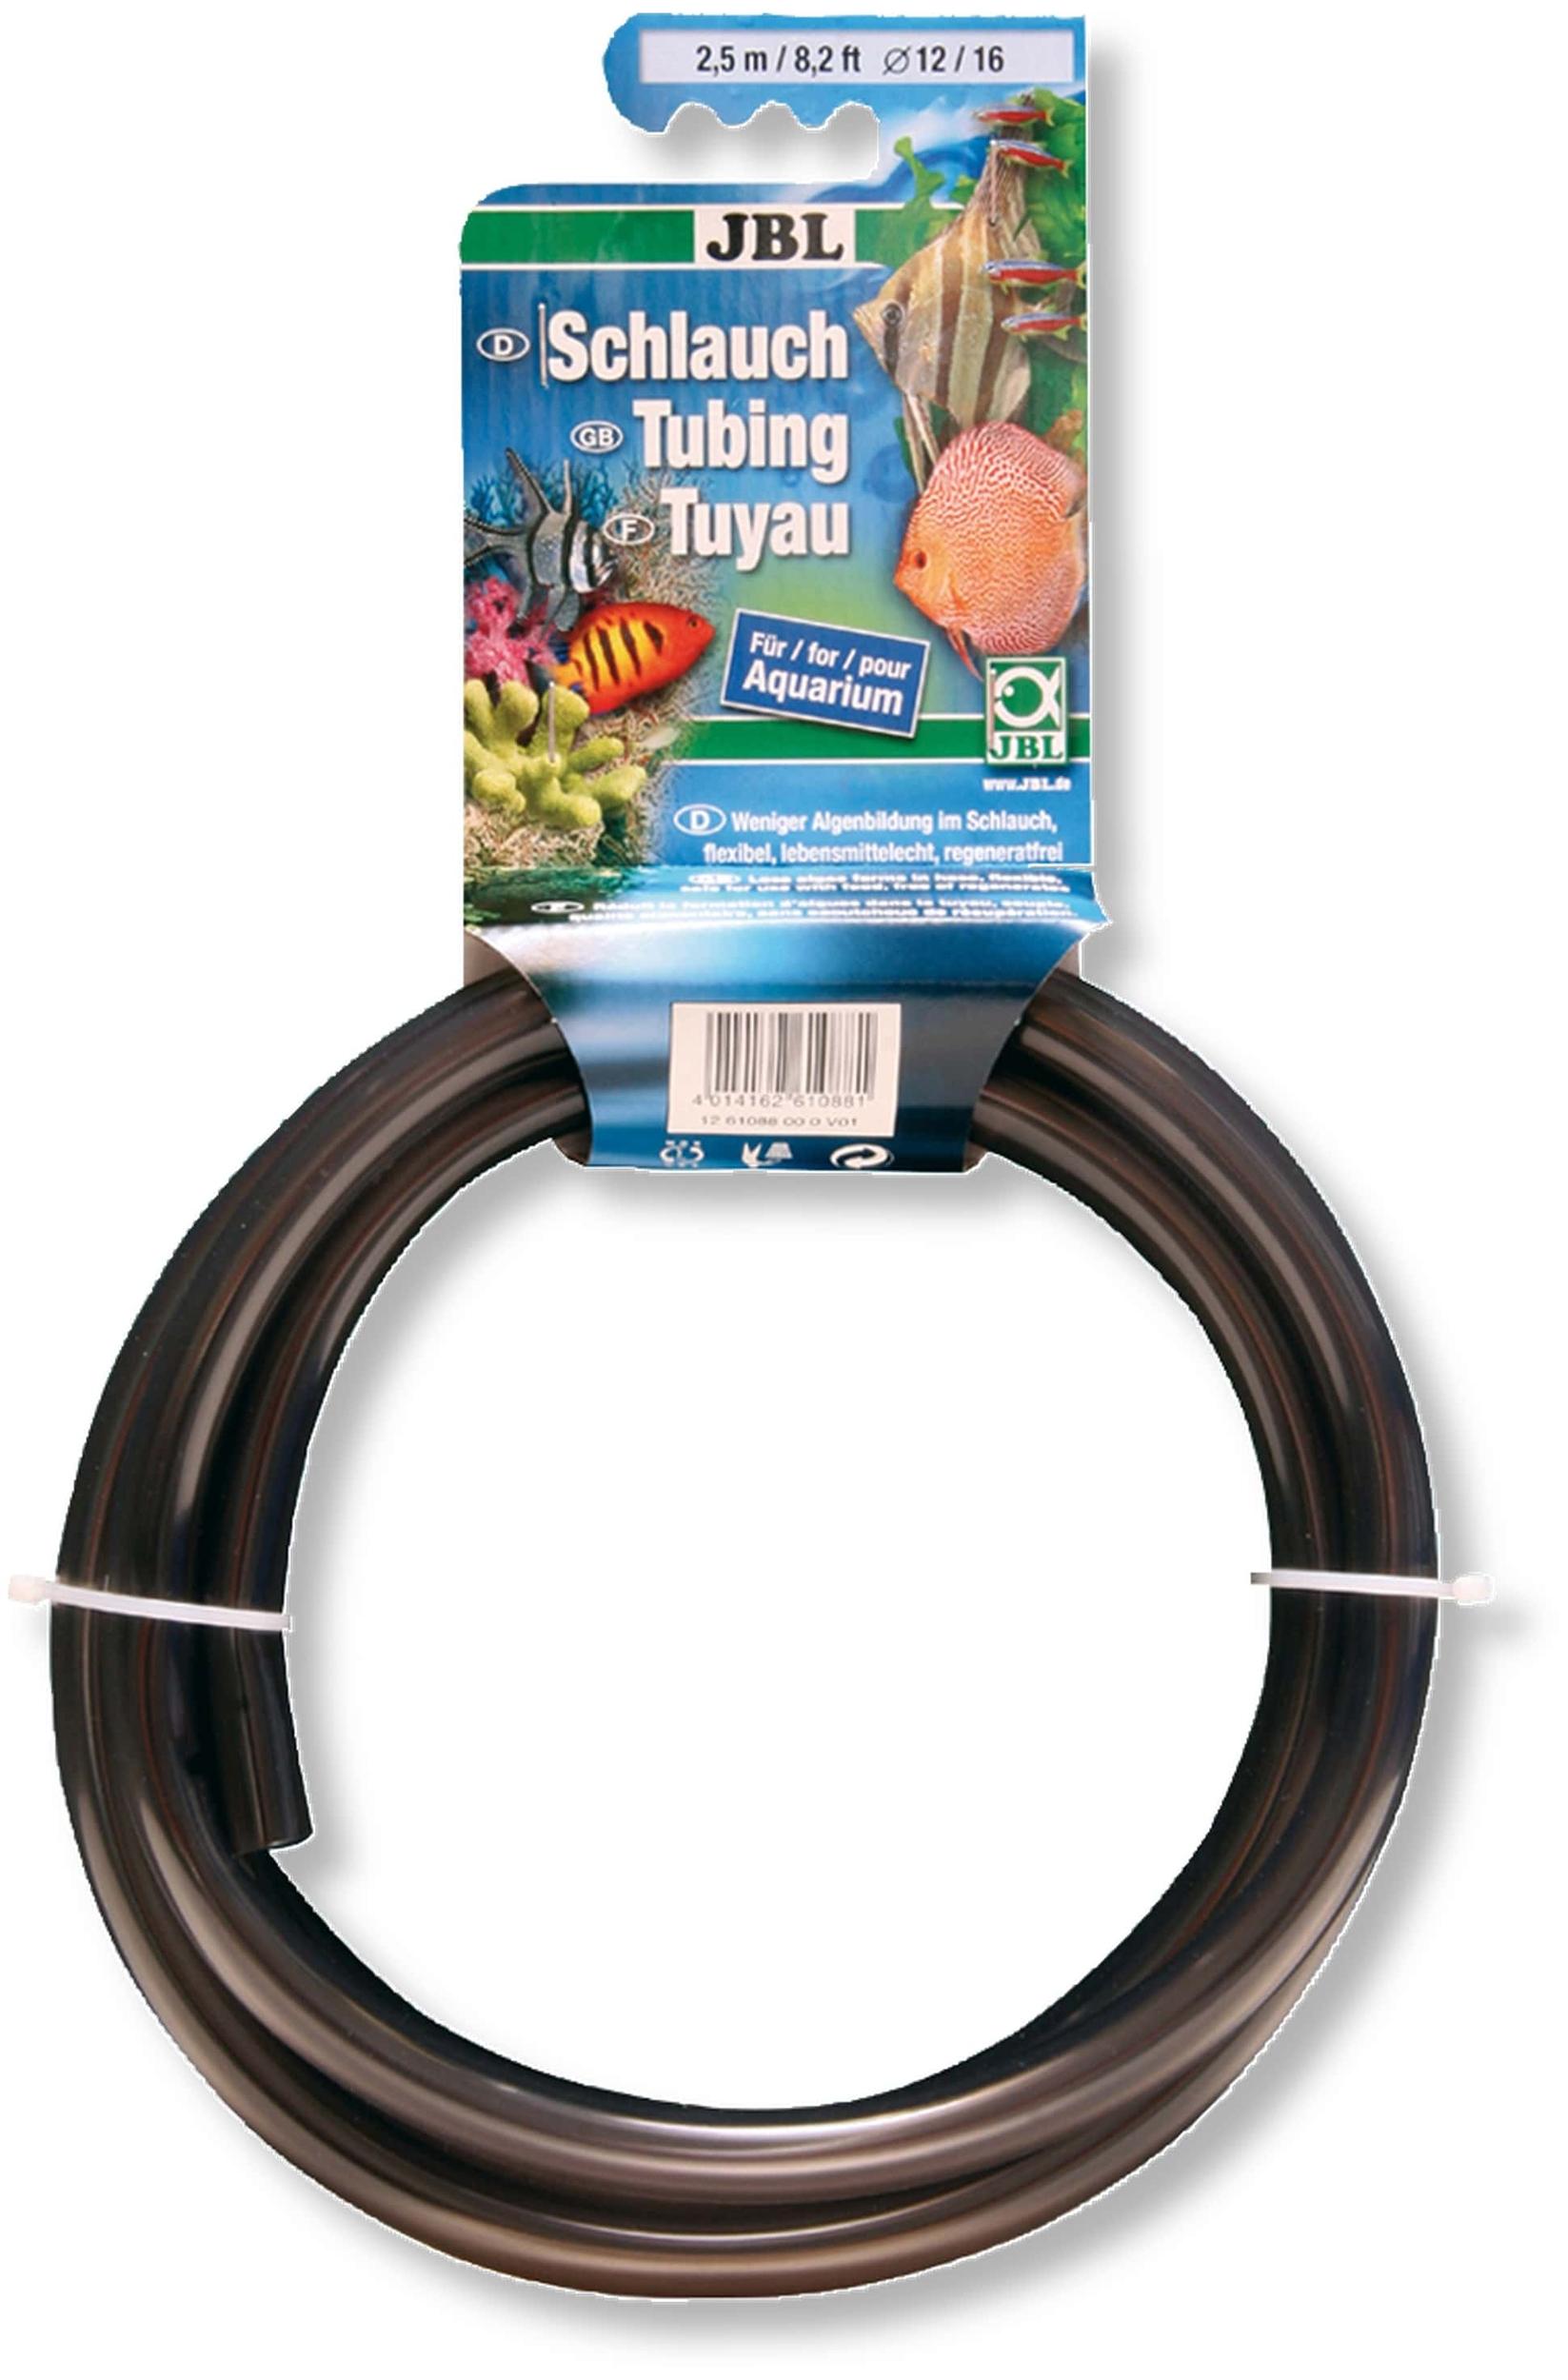 JBL Tuyau gris-transparent 12/16 2,5m anti-algues